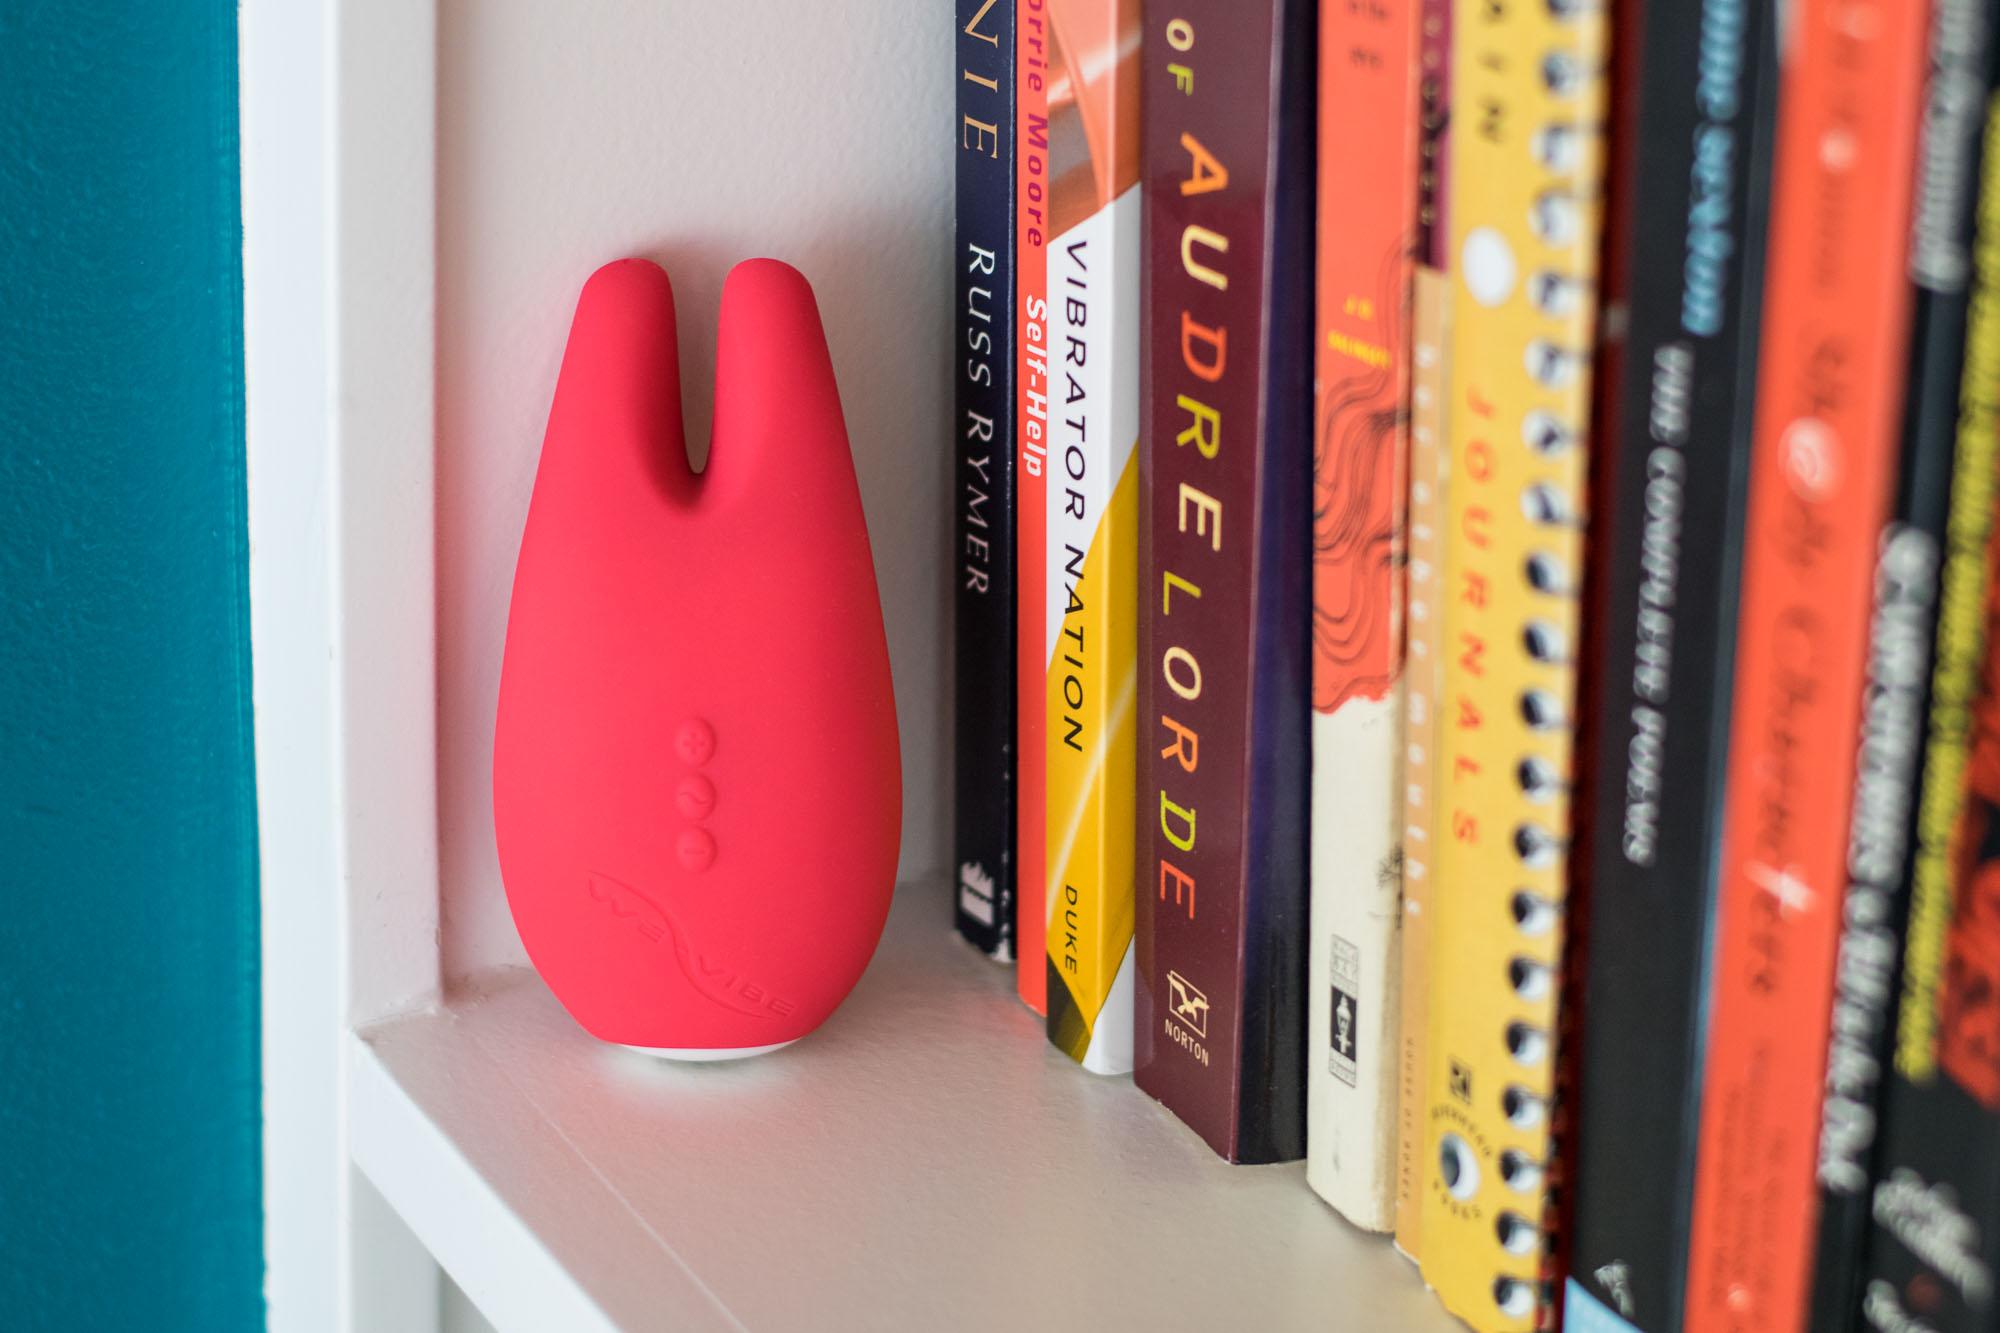 We-Vibe Gala on a bookshelf.